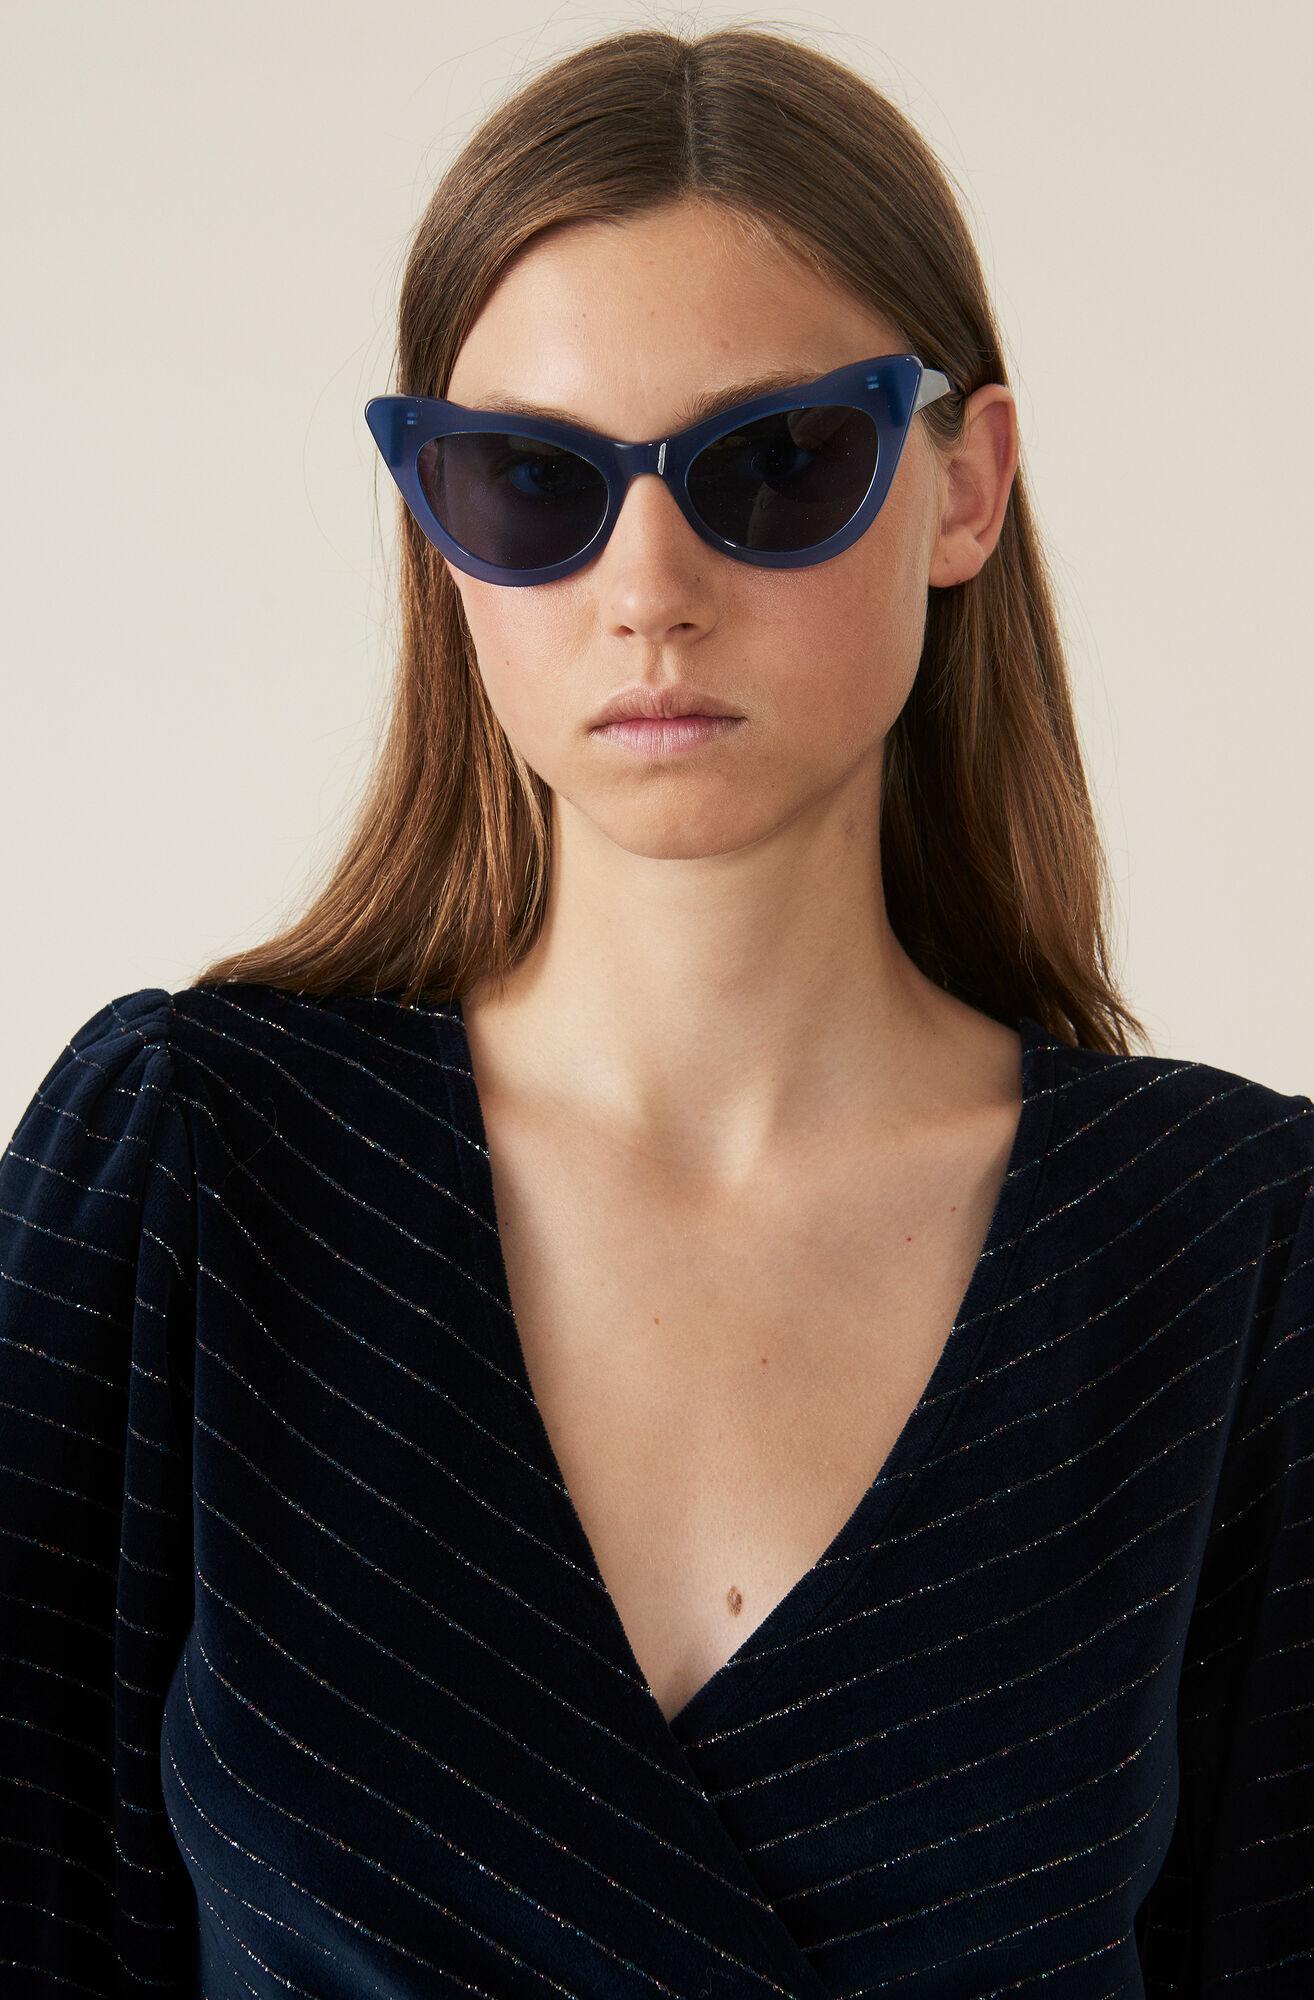 Velvet Jersey Wrap Top, Total Eclipse, hi-res